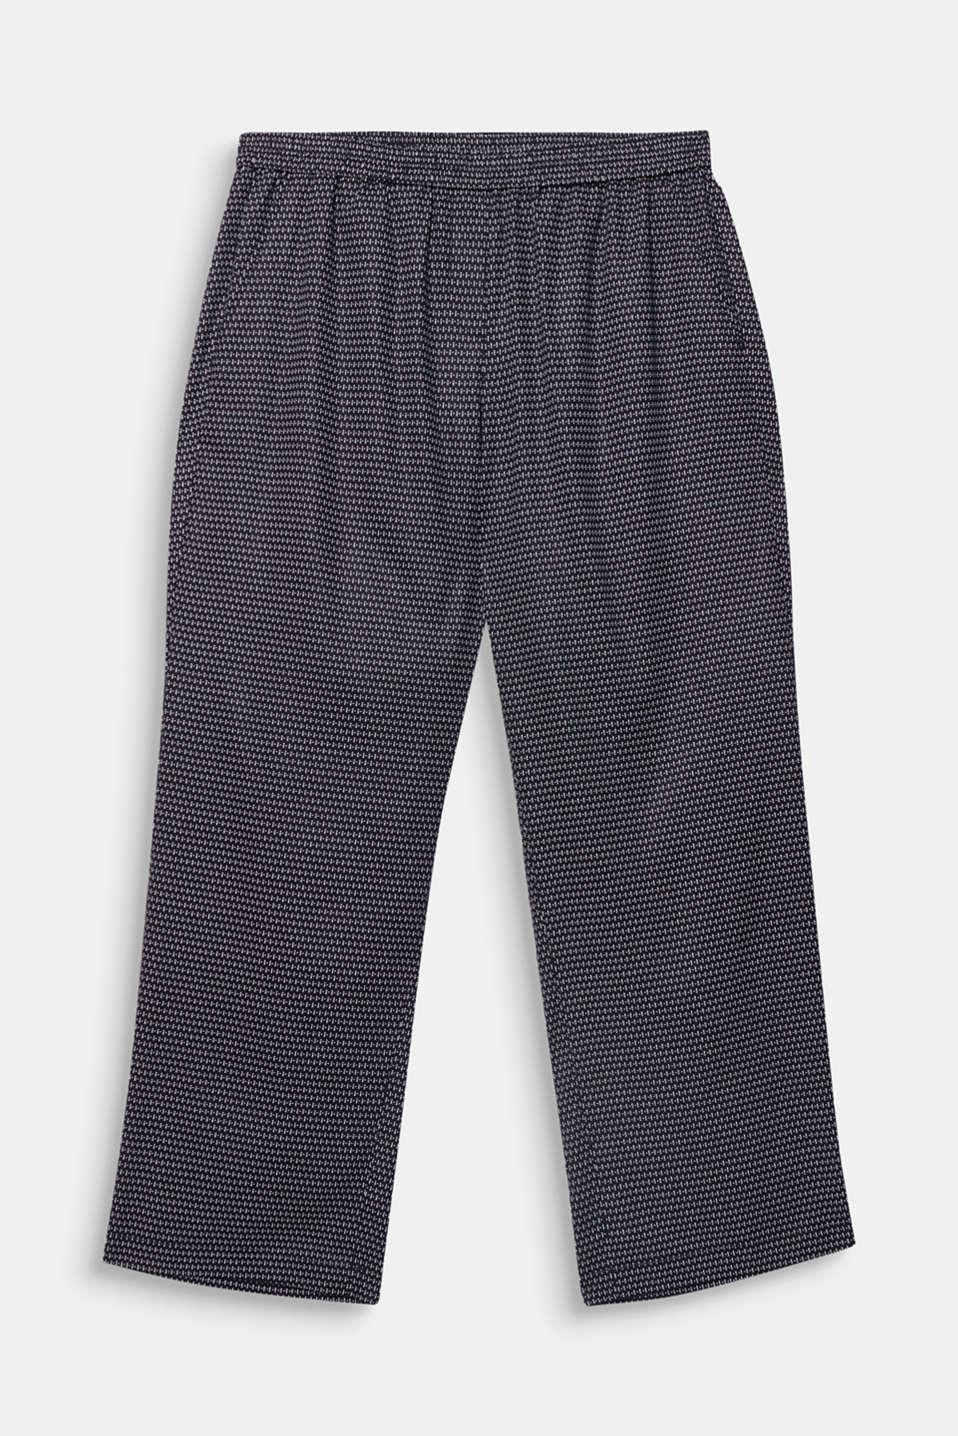 CURVY printed trousers in TENCEL™, NAVY 3, detail image number 5